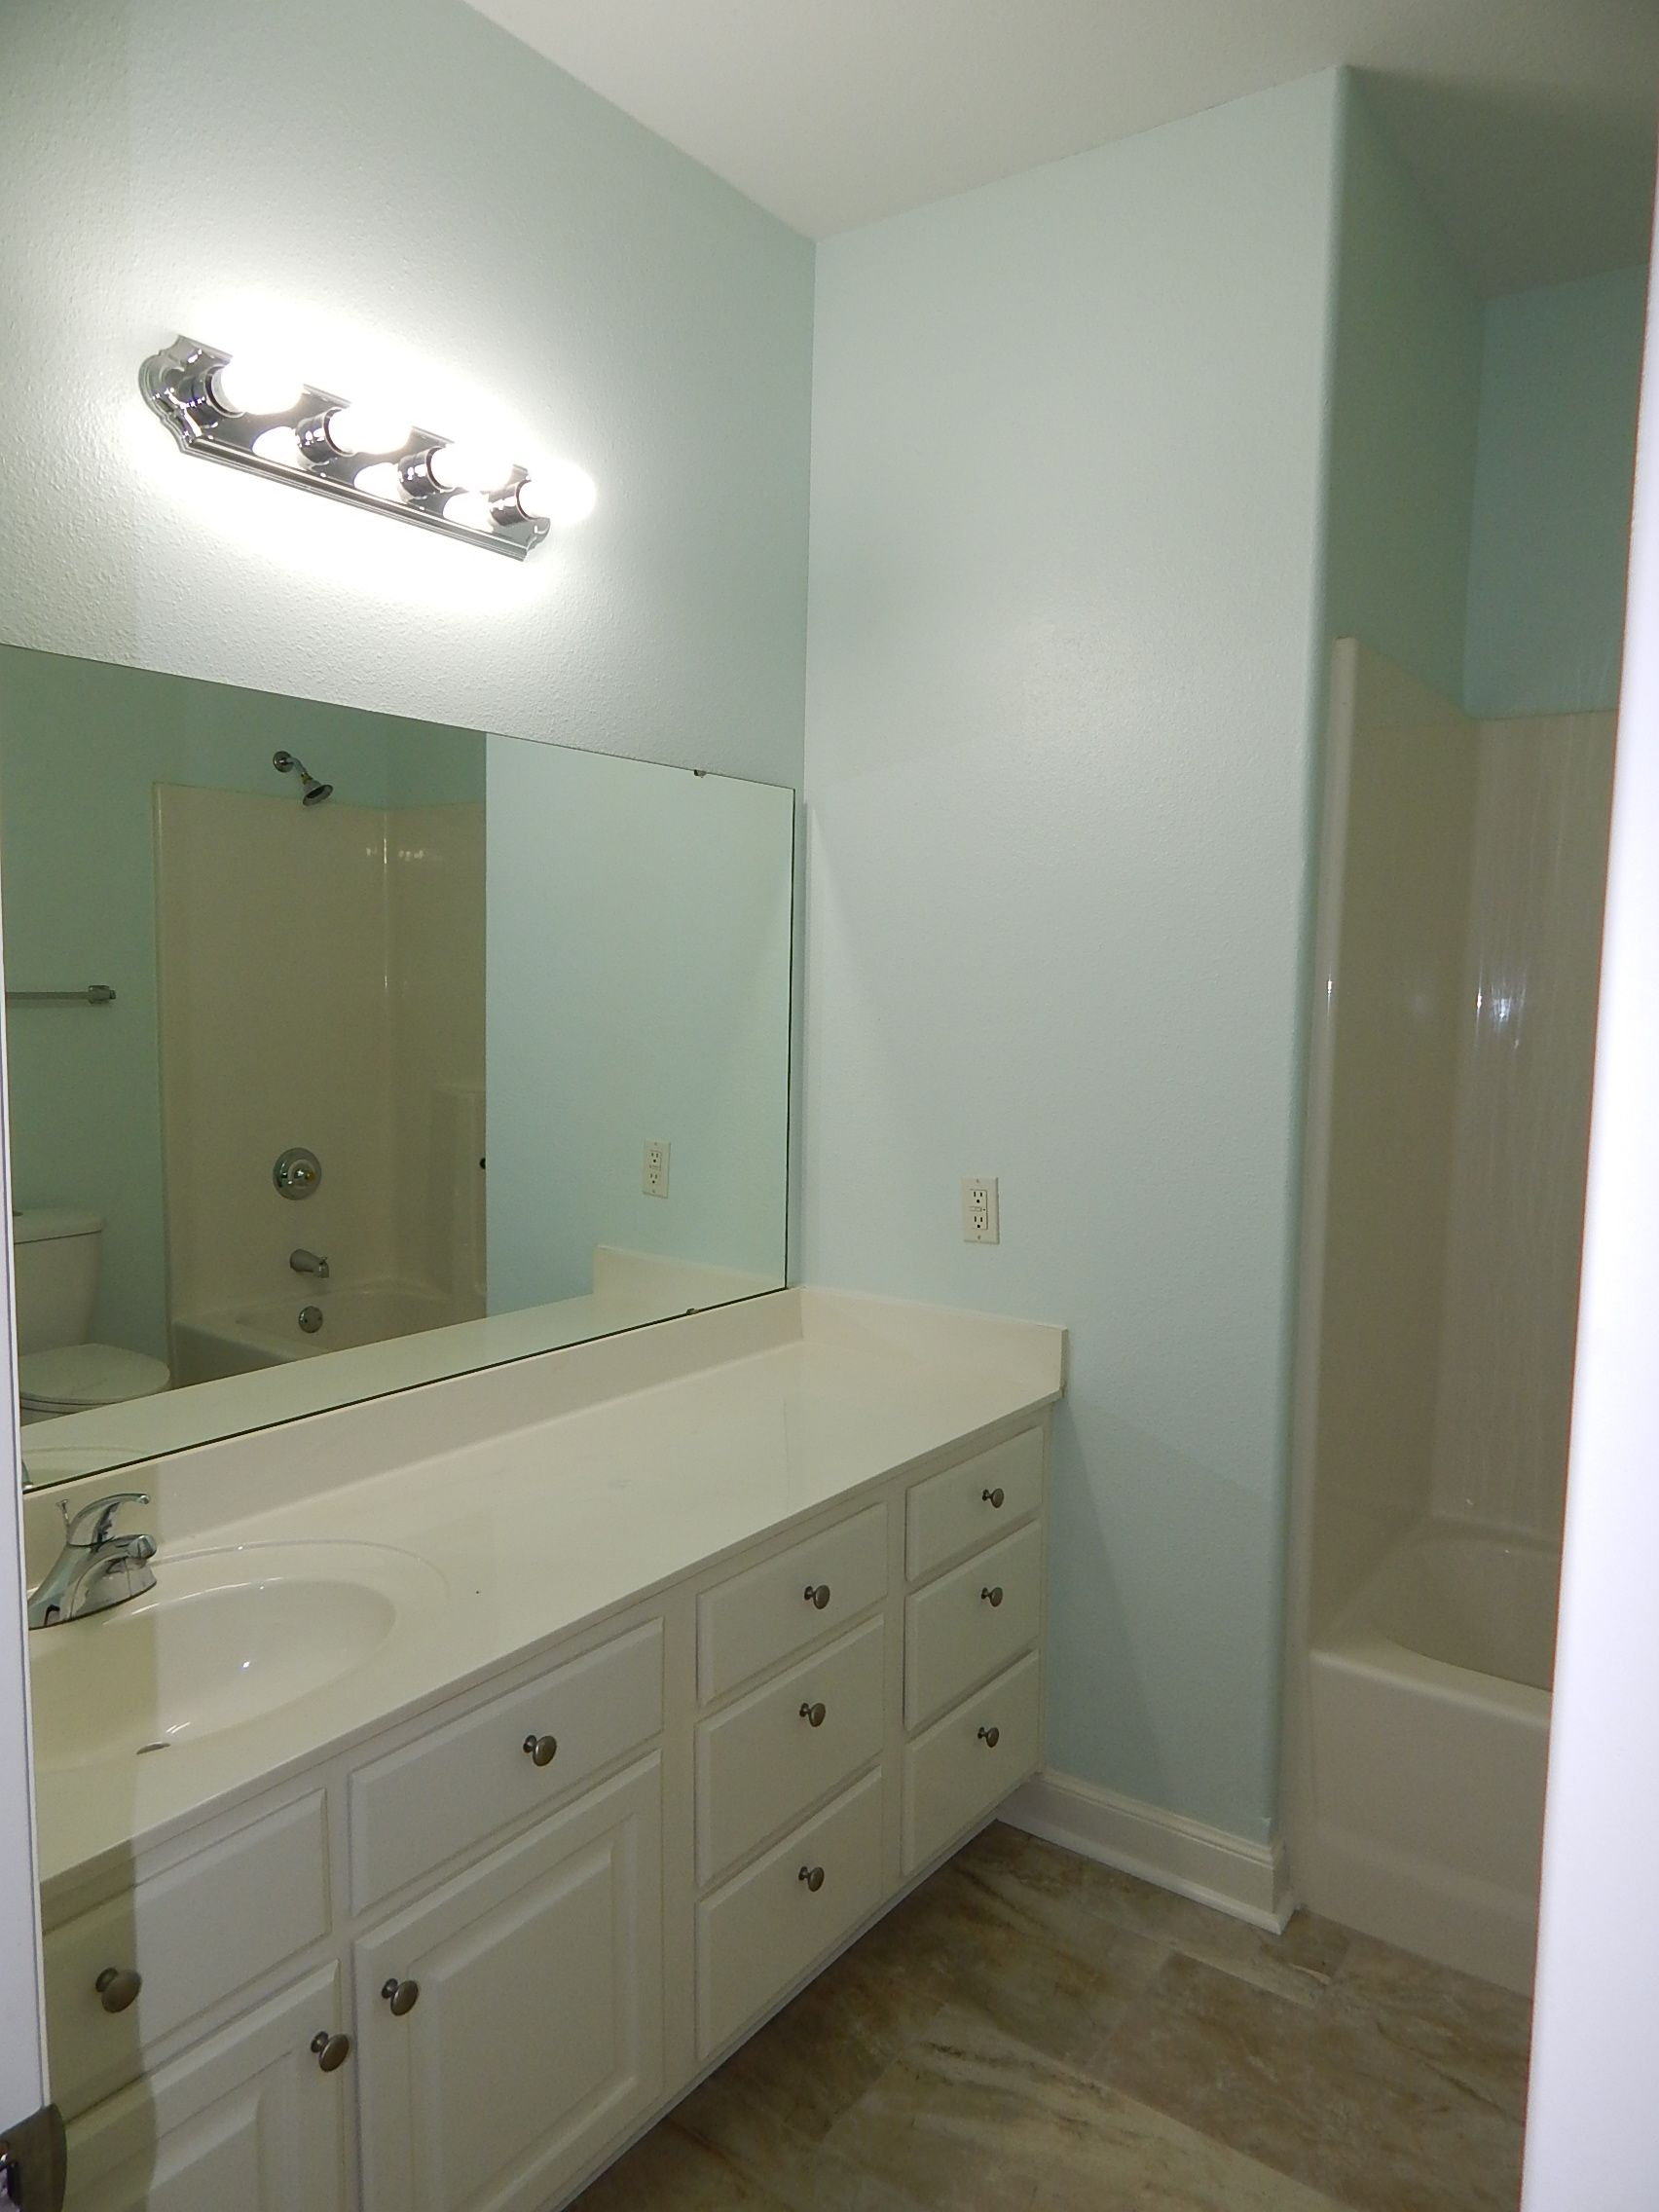 Lowes Shower Tile Mauorel Com